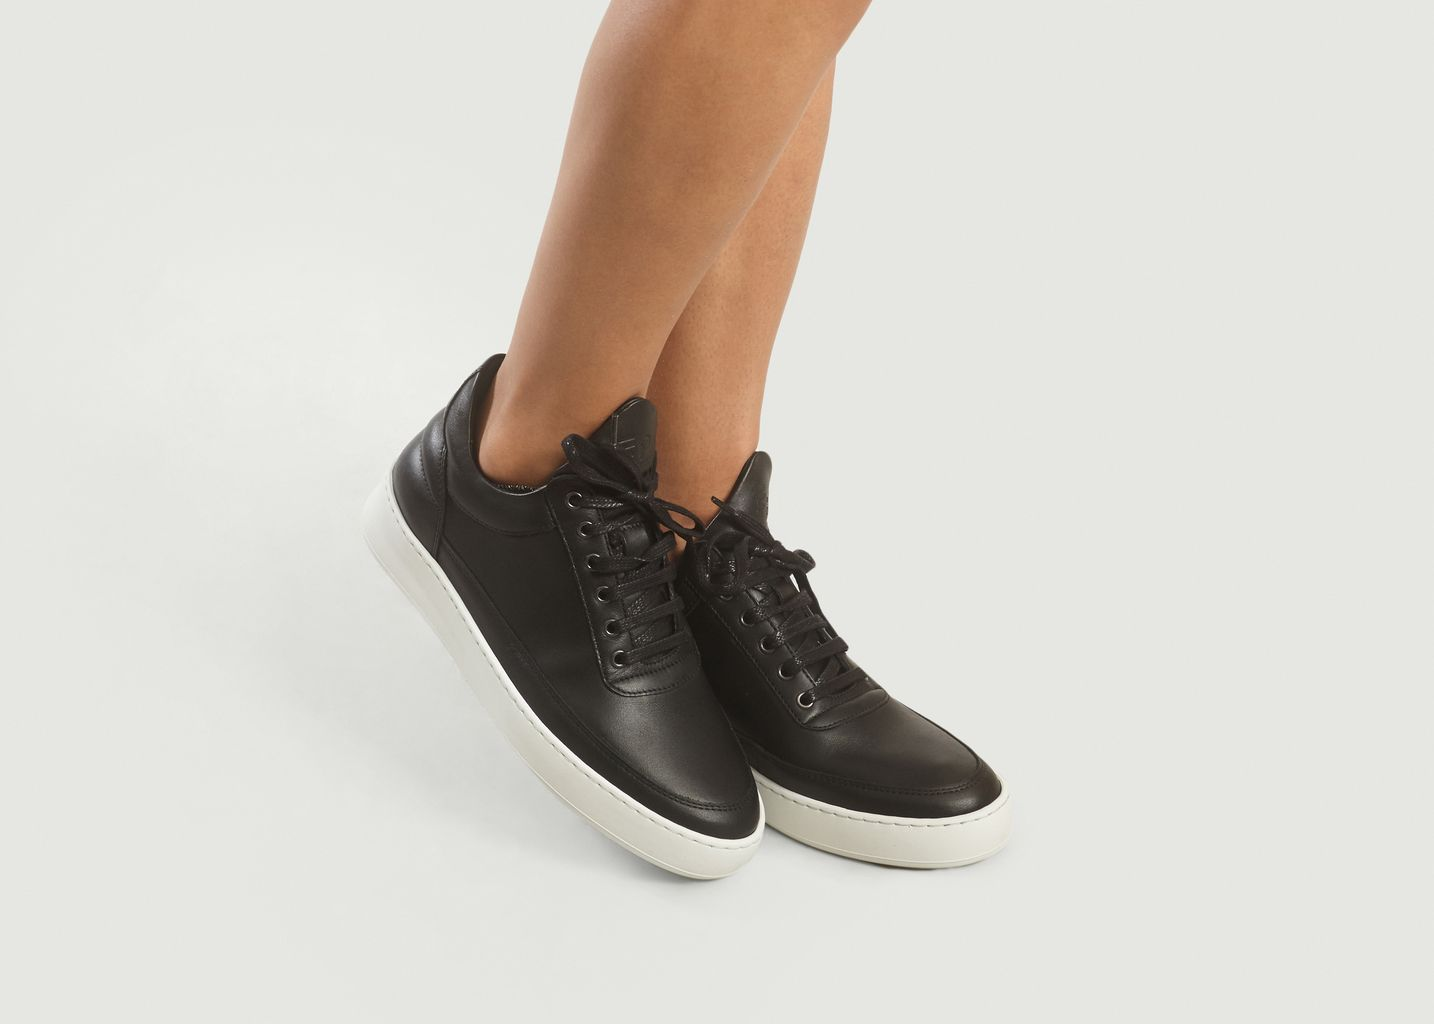 Cuir Lisse Top Noir Lane Filling PiecesL'exception Nappa Low Sneakers LpSGUVMzq